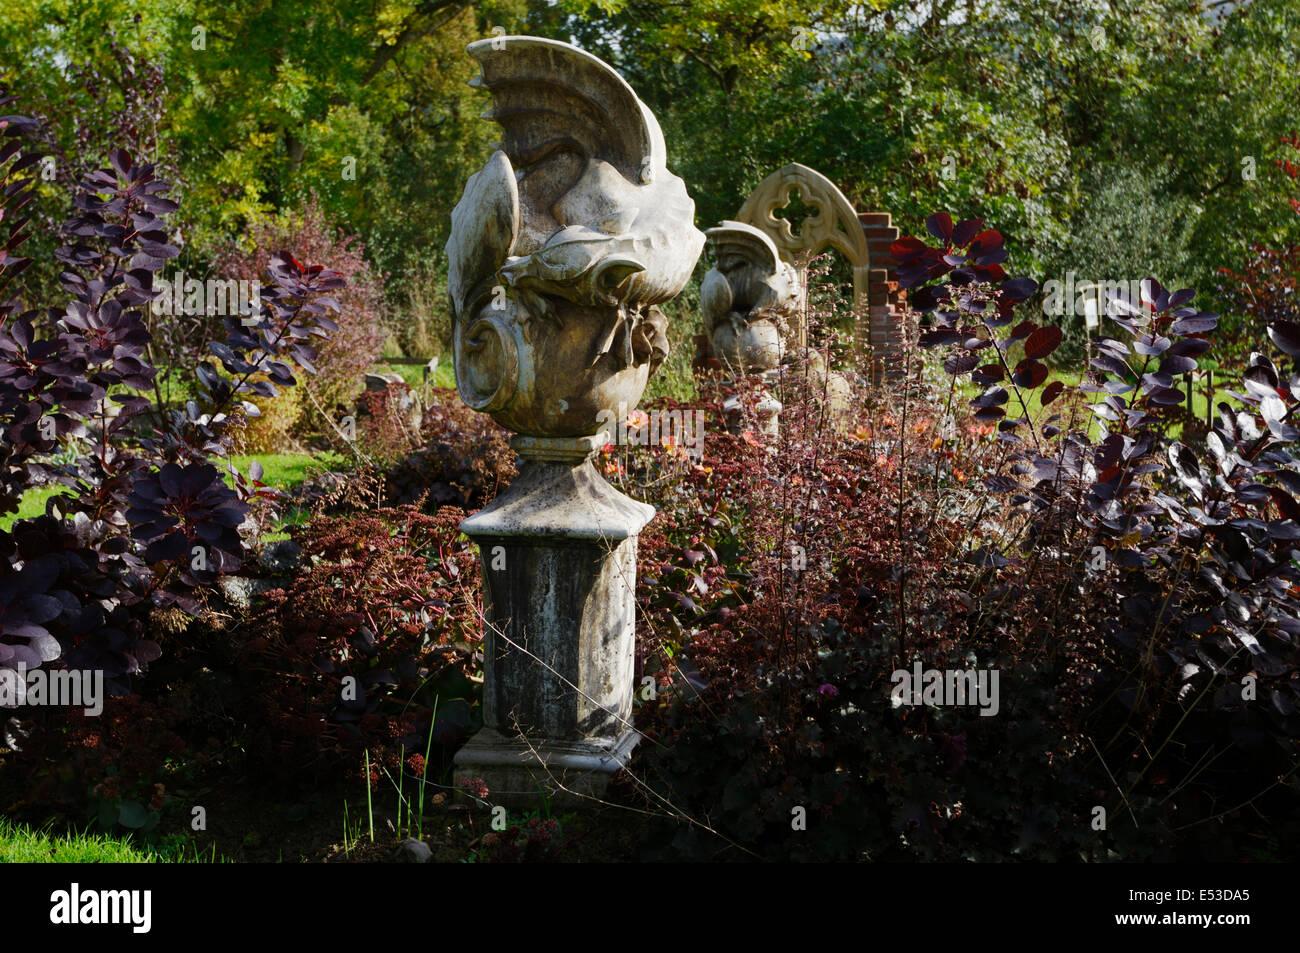 Ordinaire The Gothic Garden At Sculptureheaven Sculpture Garden, Rhydlewis,  Llandysul, Wales, UK.